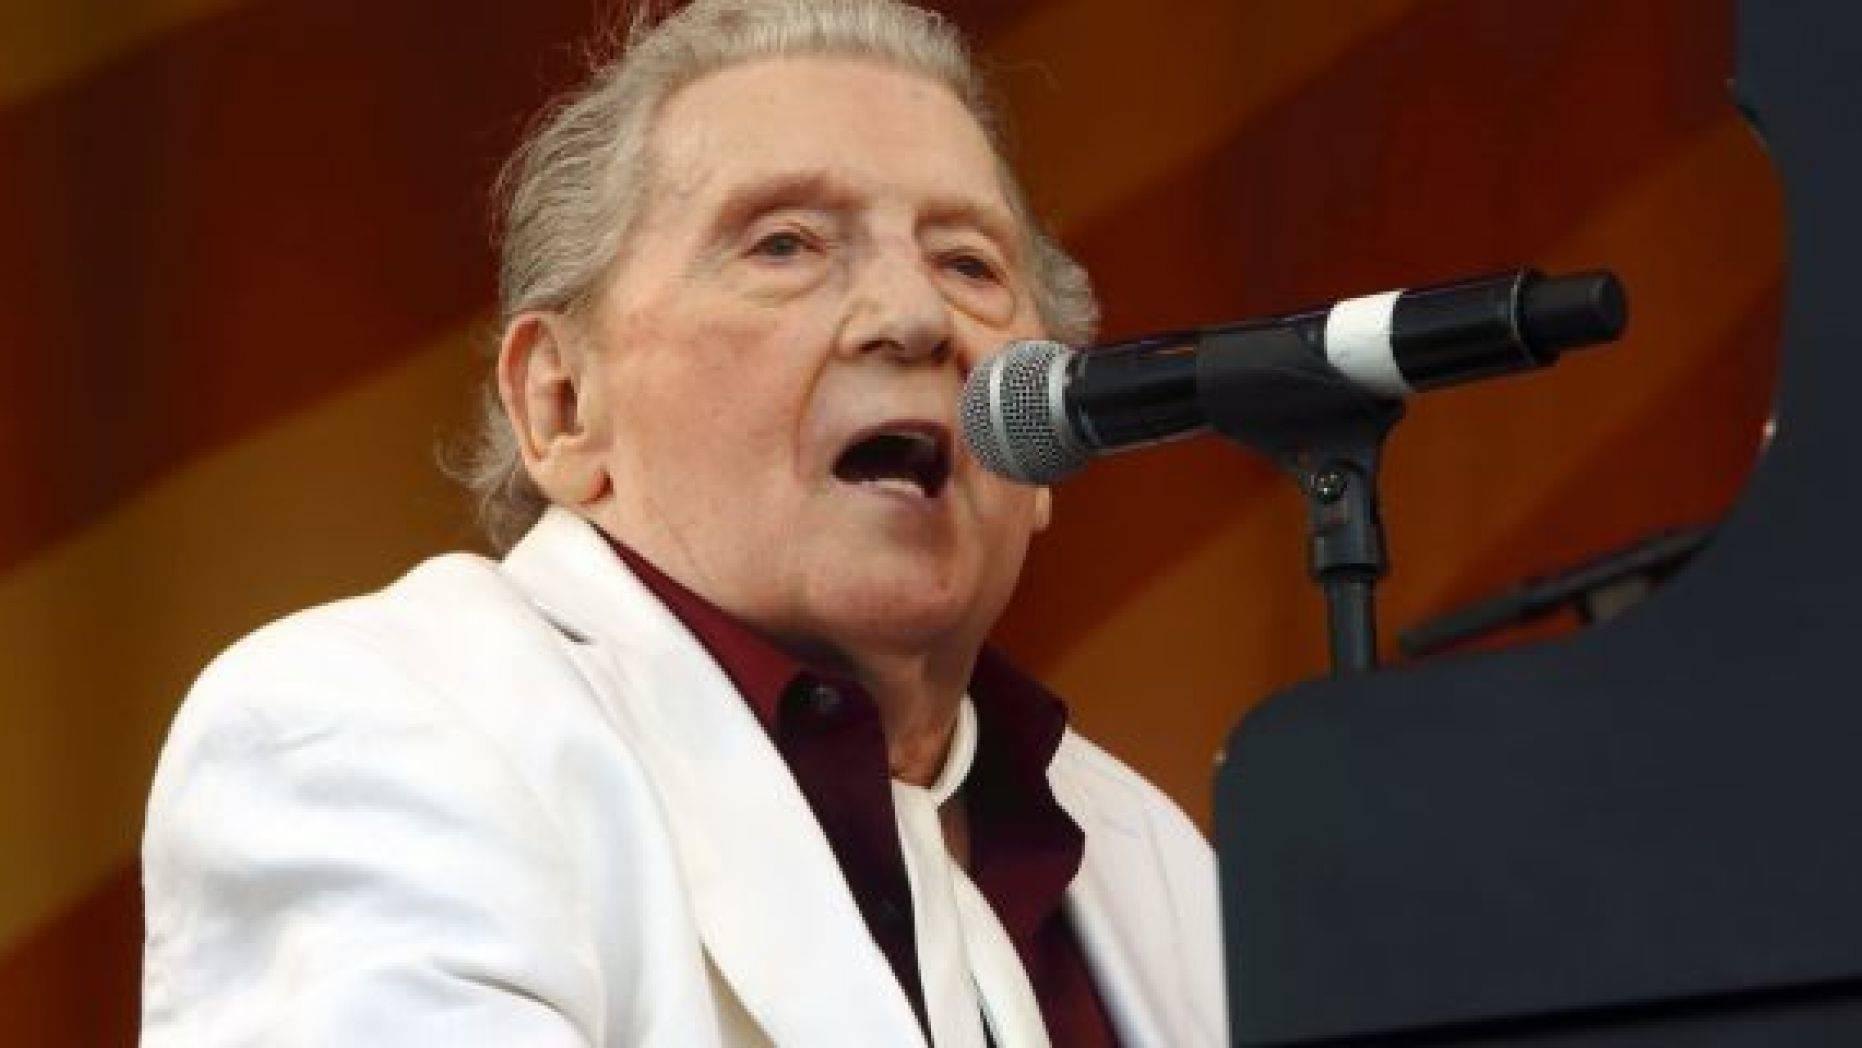 Cantaretul Jerry Lee Lewis a suferit un accident vascular cerebral